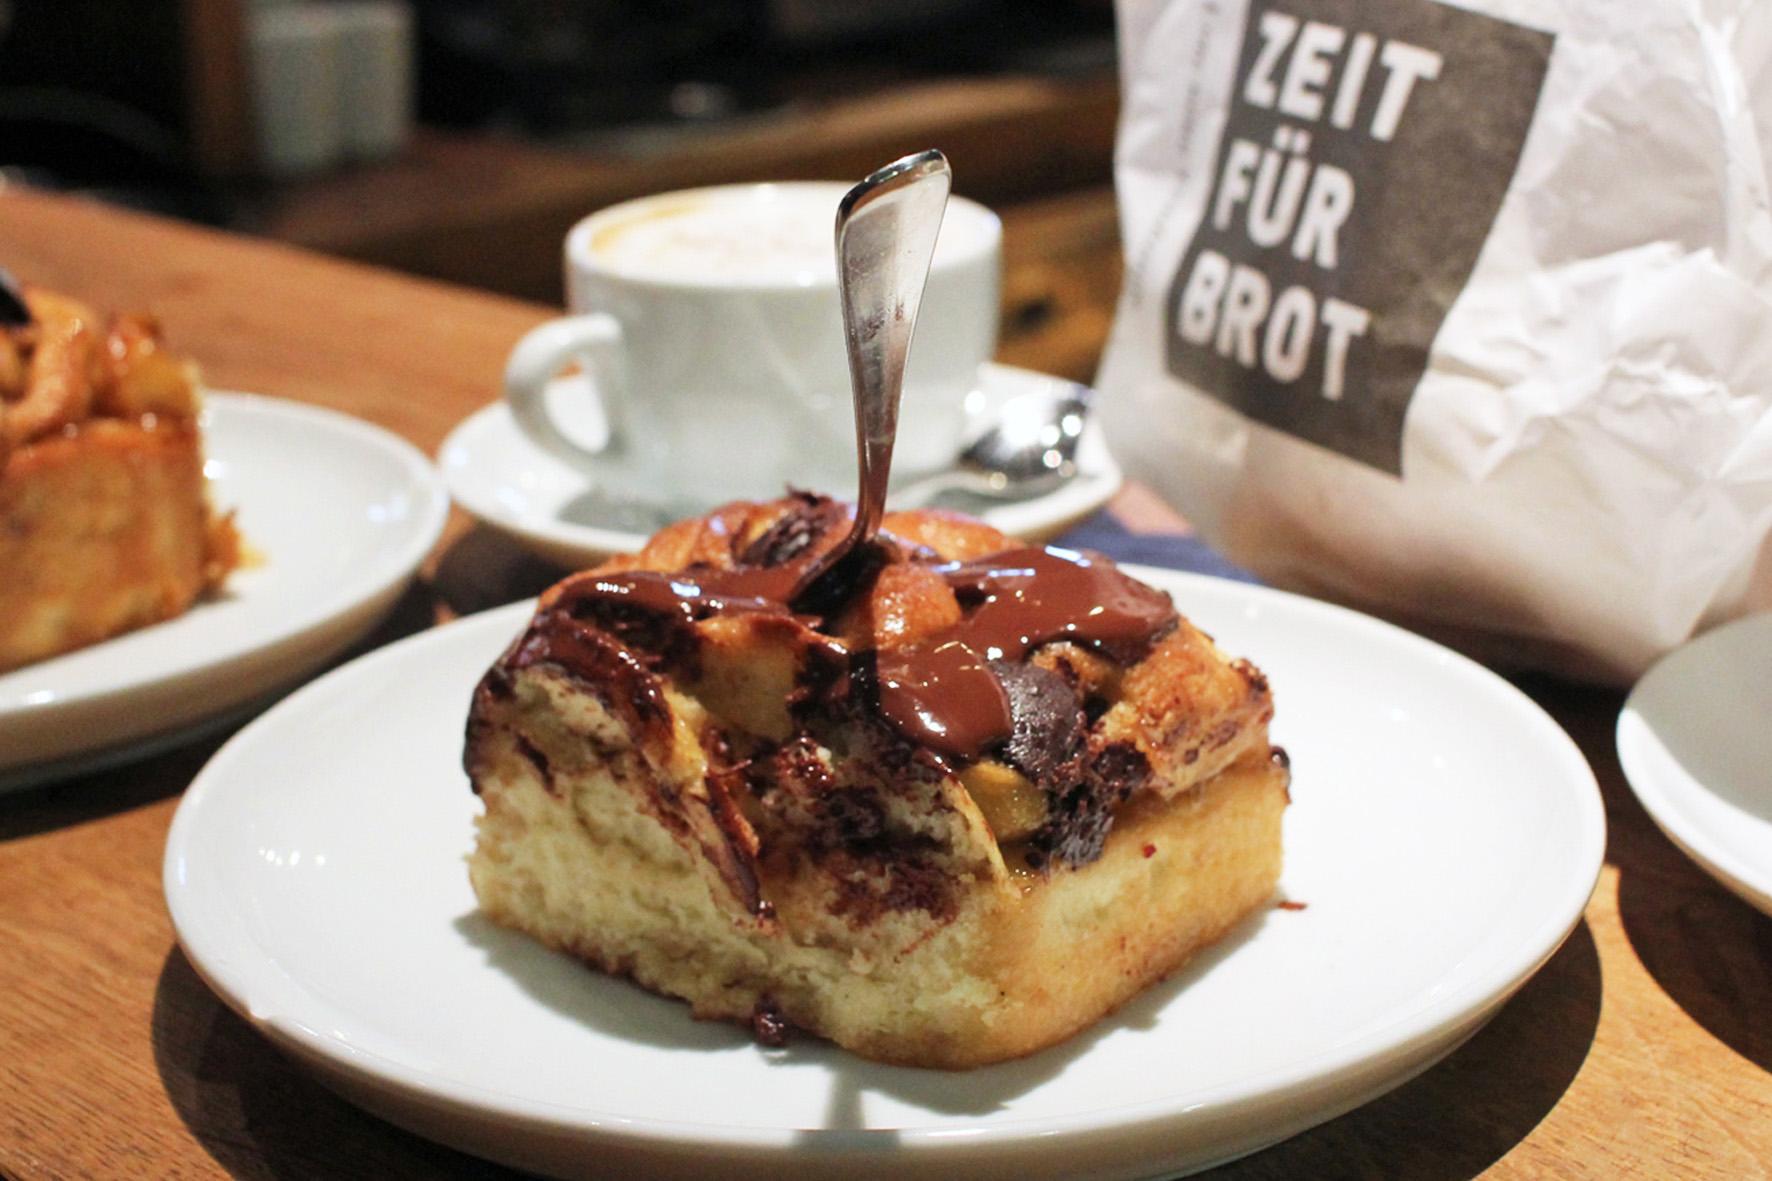 Zeit Für Brot - Organic Artisan Bakery in Berlin - andBerlin